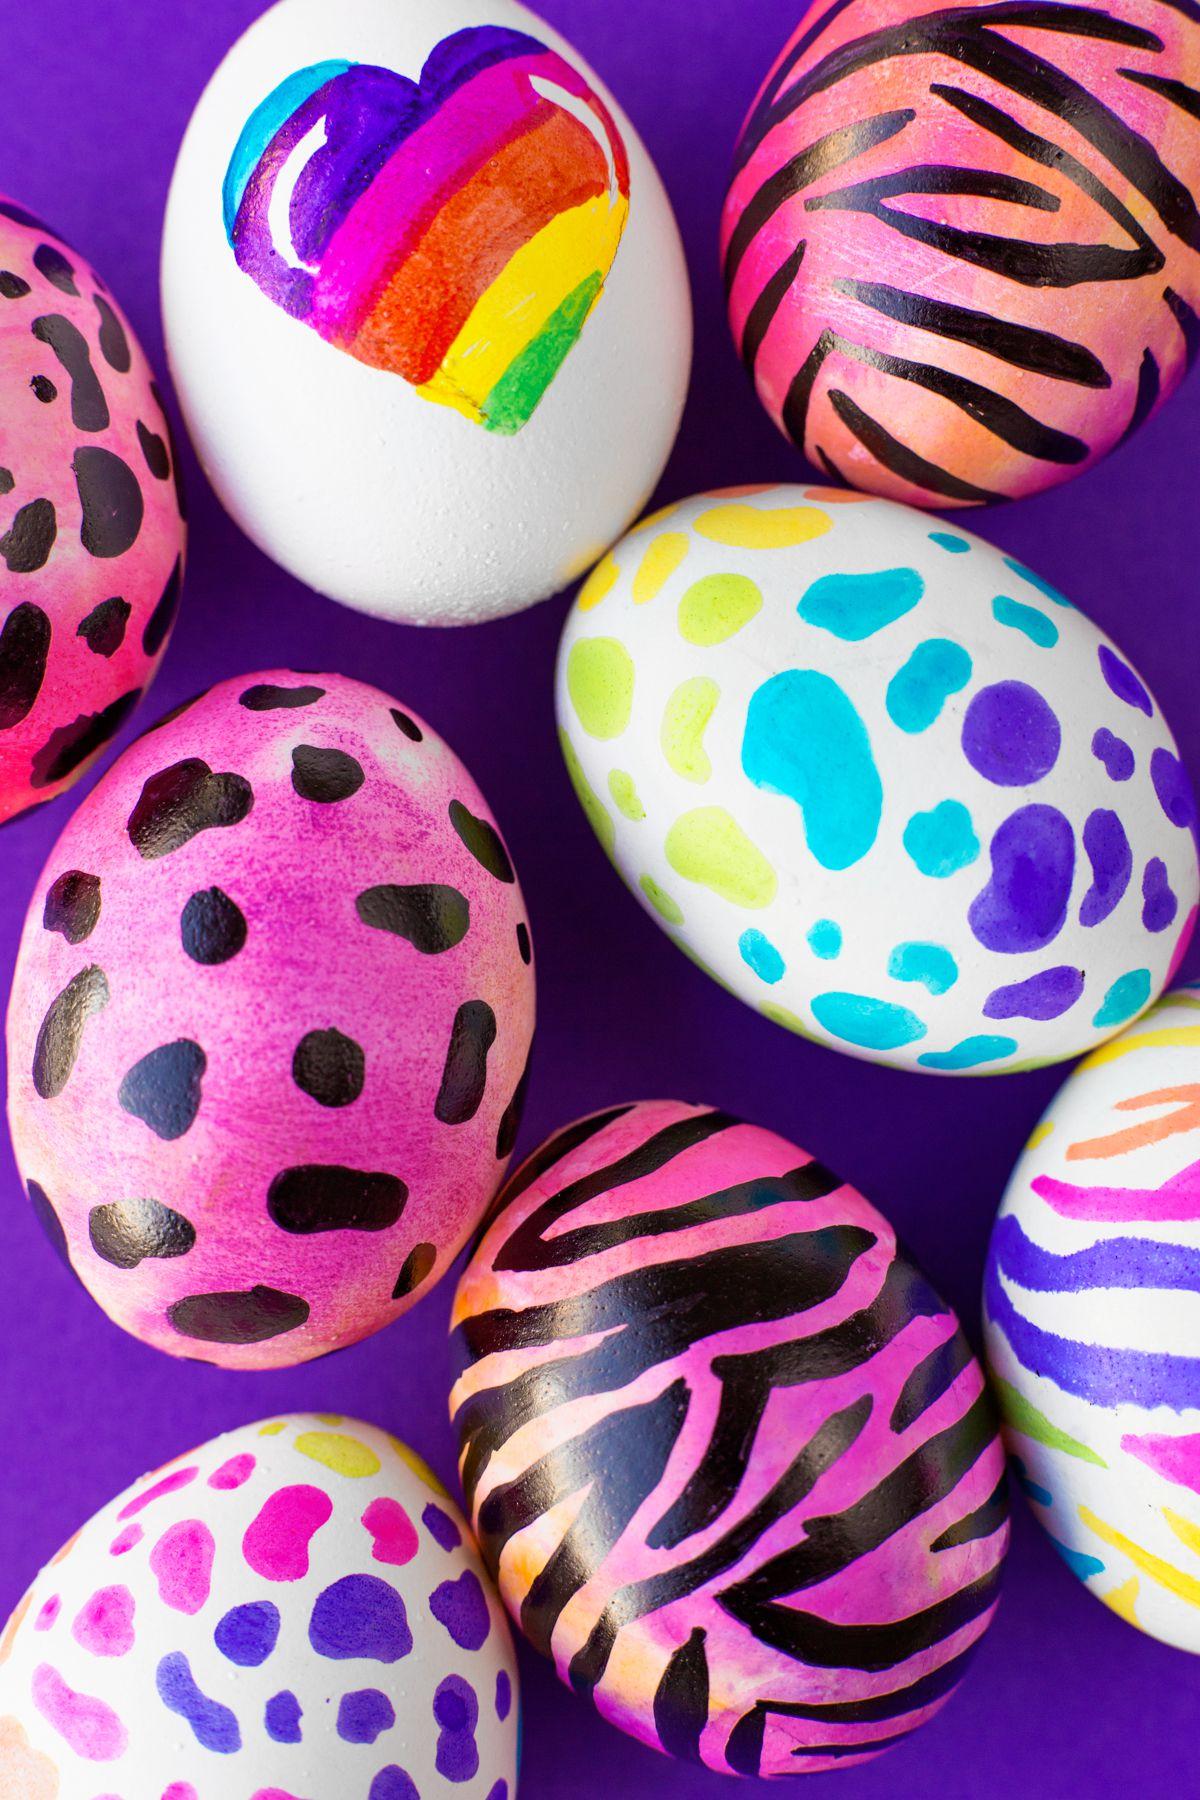 16 Spectacular Easter Egg Designs - Easy DIY Easter Egg Ideas